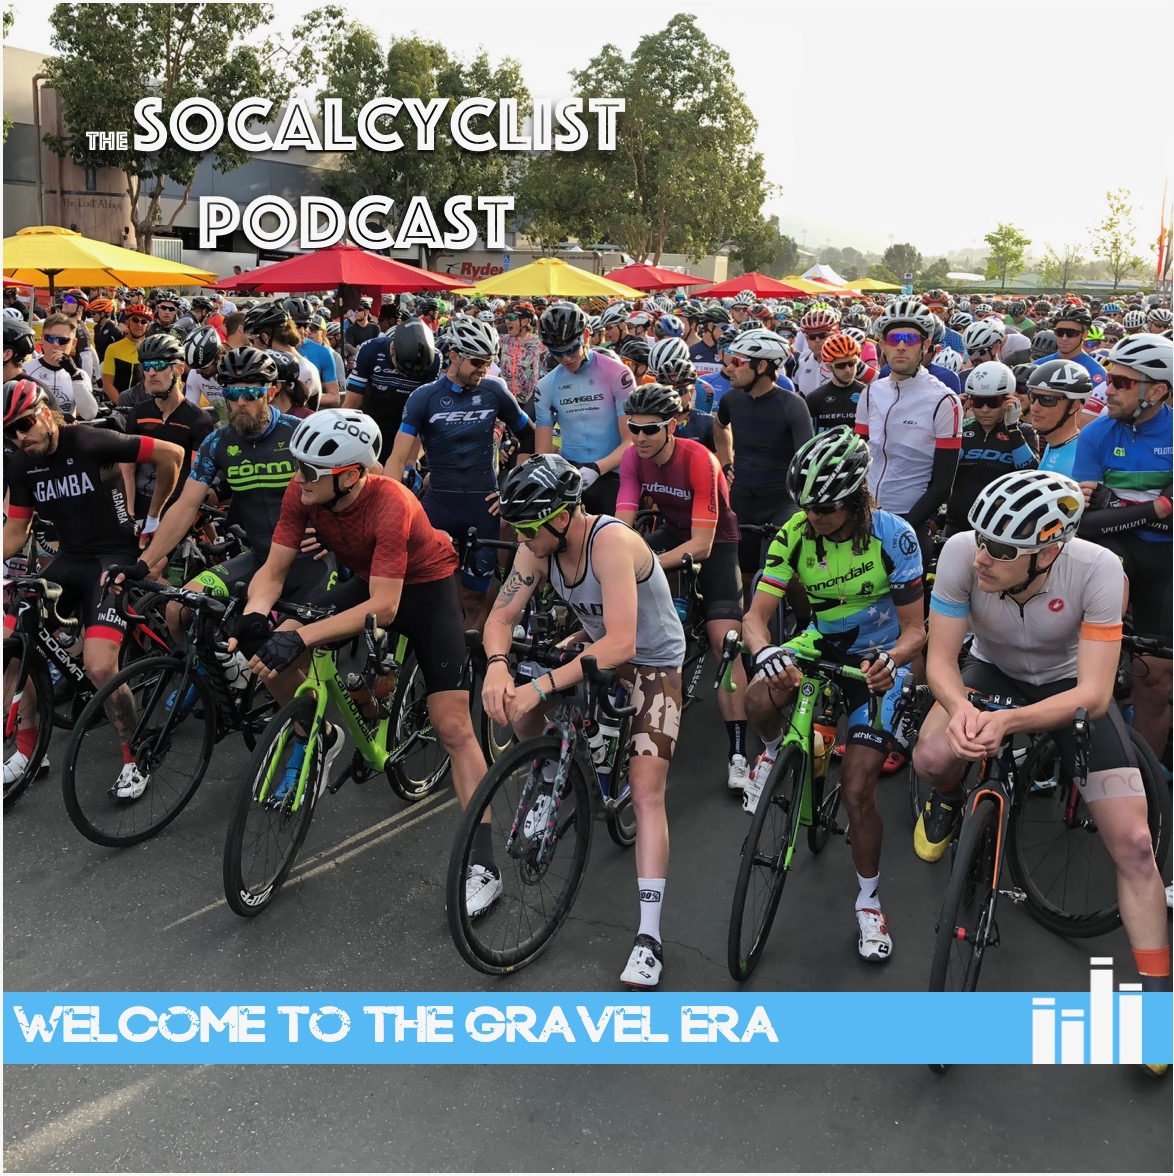 socal cyclist podcast bwr 2018.JPG